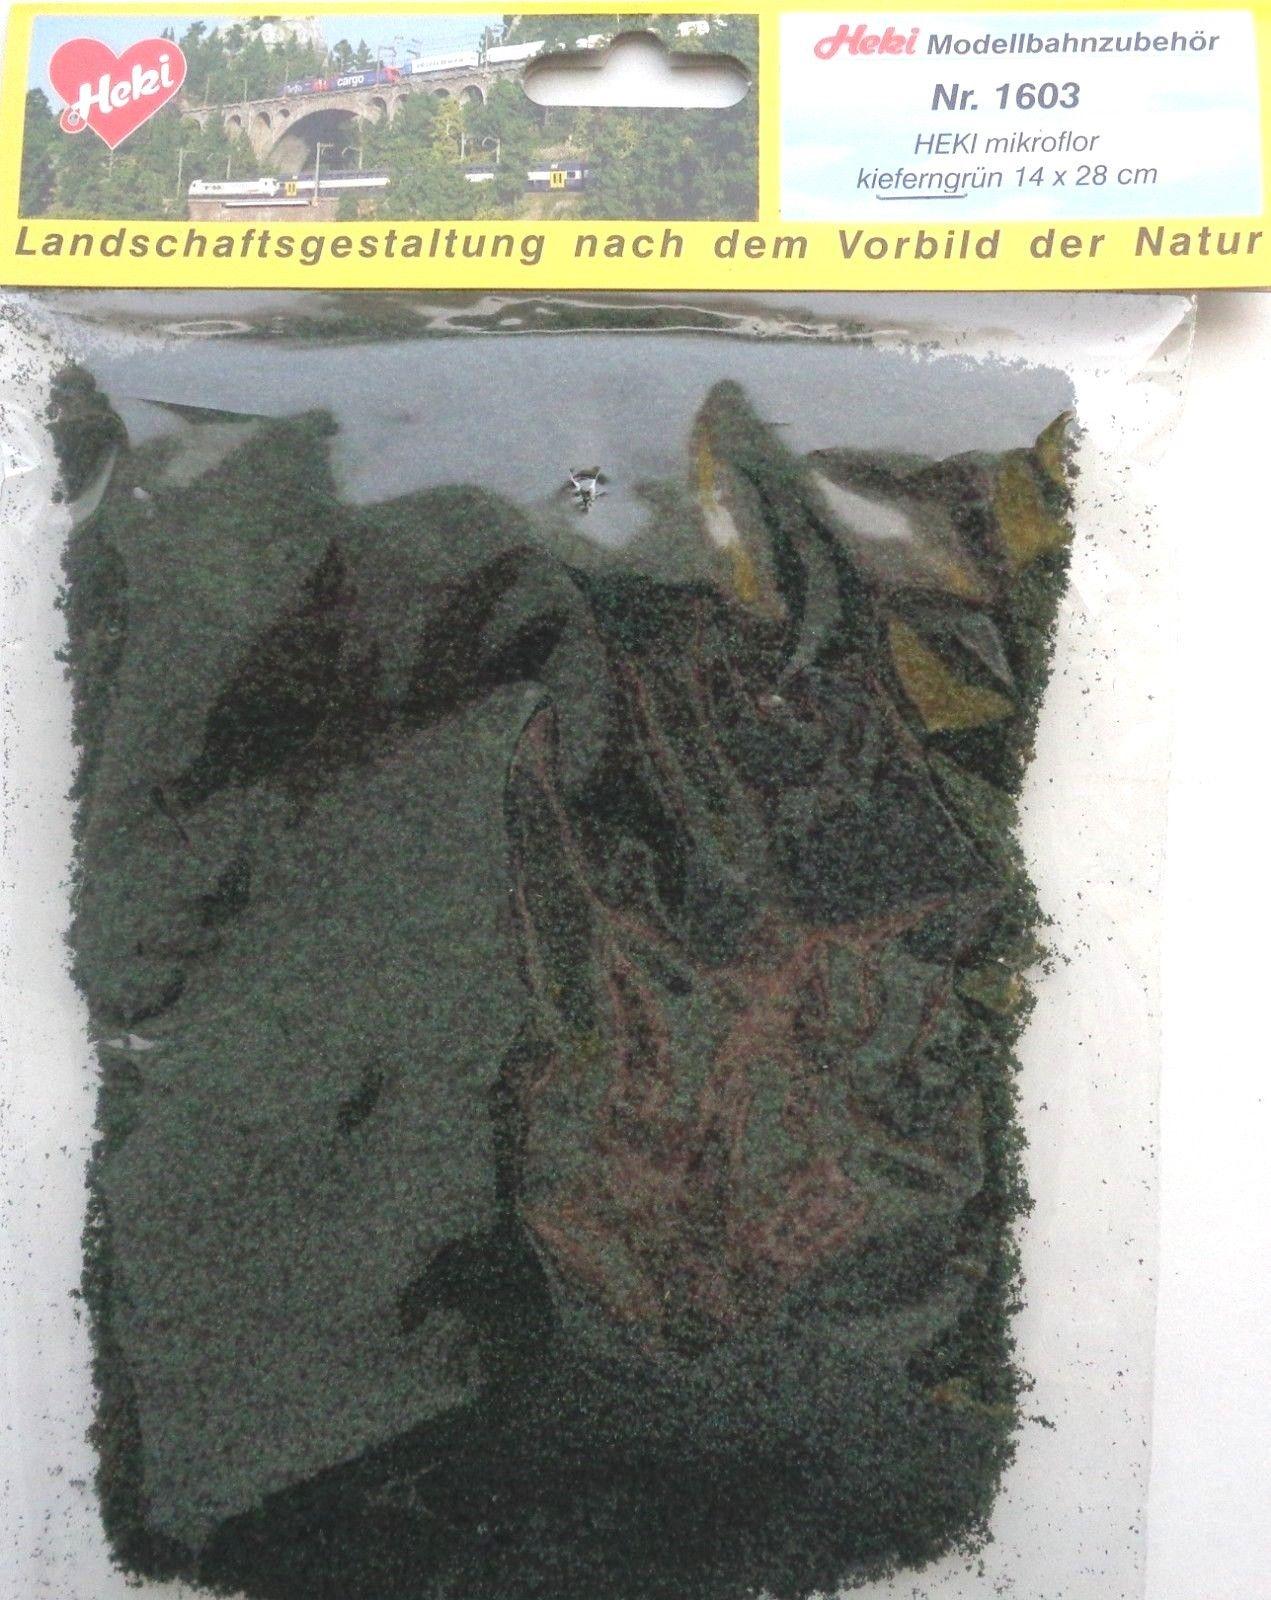 Heki 1603 Heki mikroflor kieferngrün